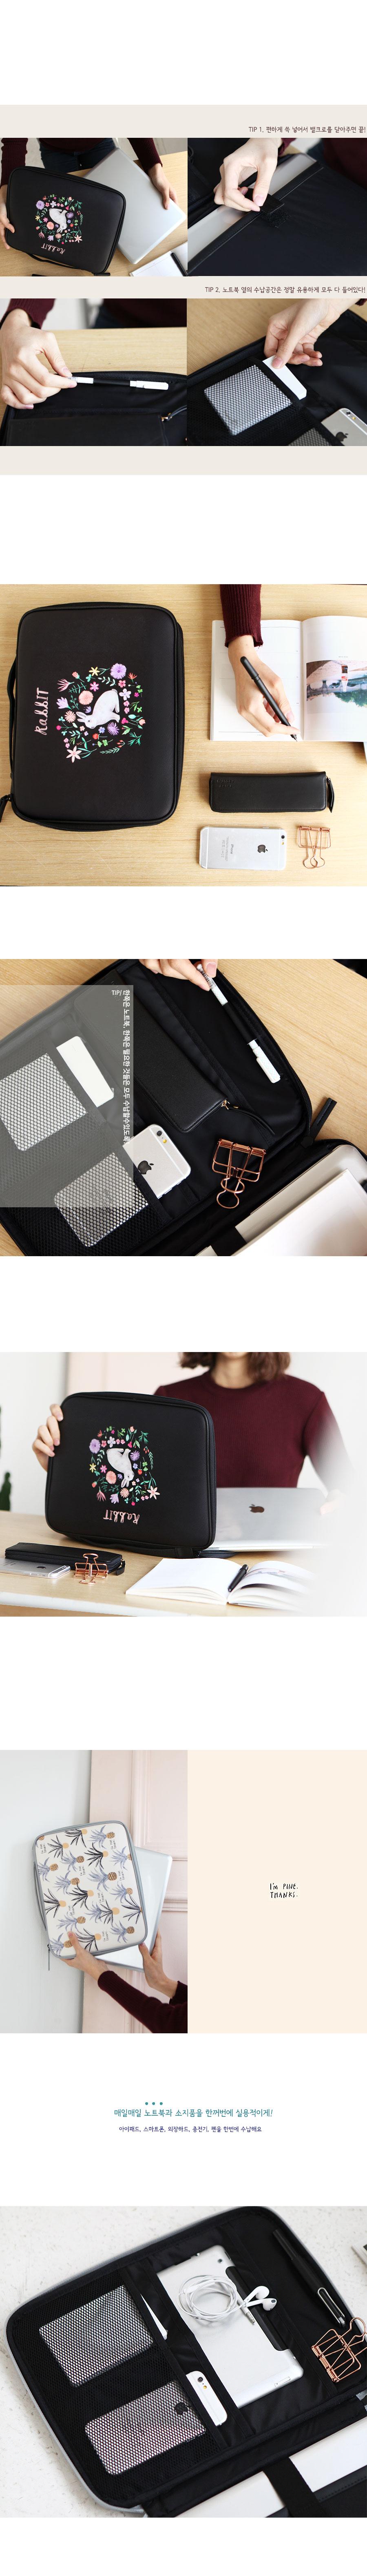 Rim 멀티 노트북 케이스 - Rabbit - 위드앨리스, 38,000원, 노트북 케이스/파우치, 27.94cm~33.78cm